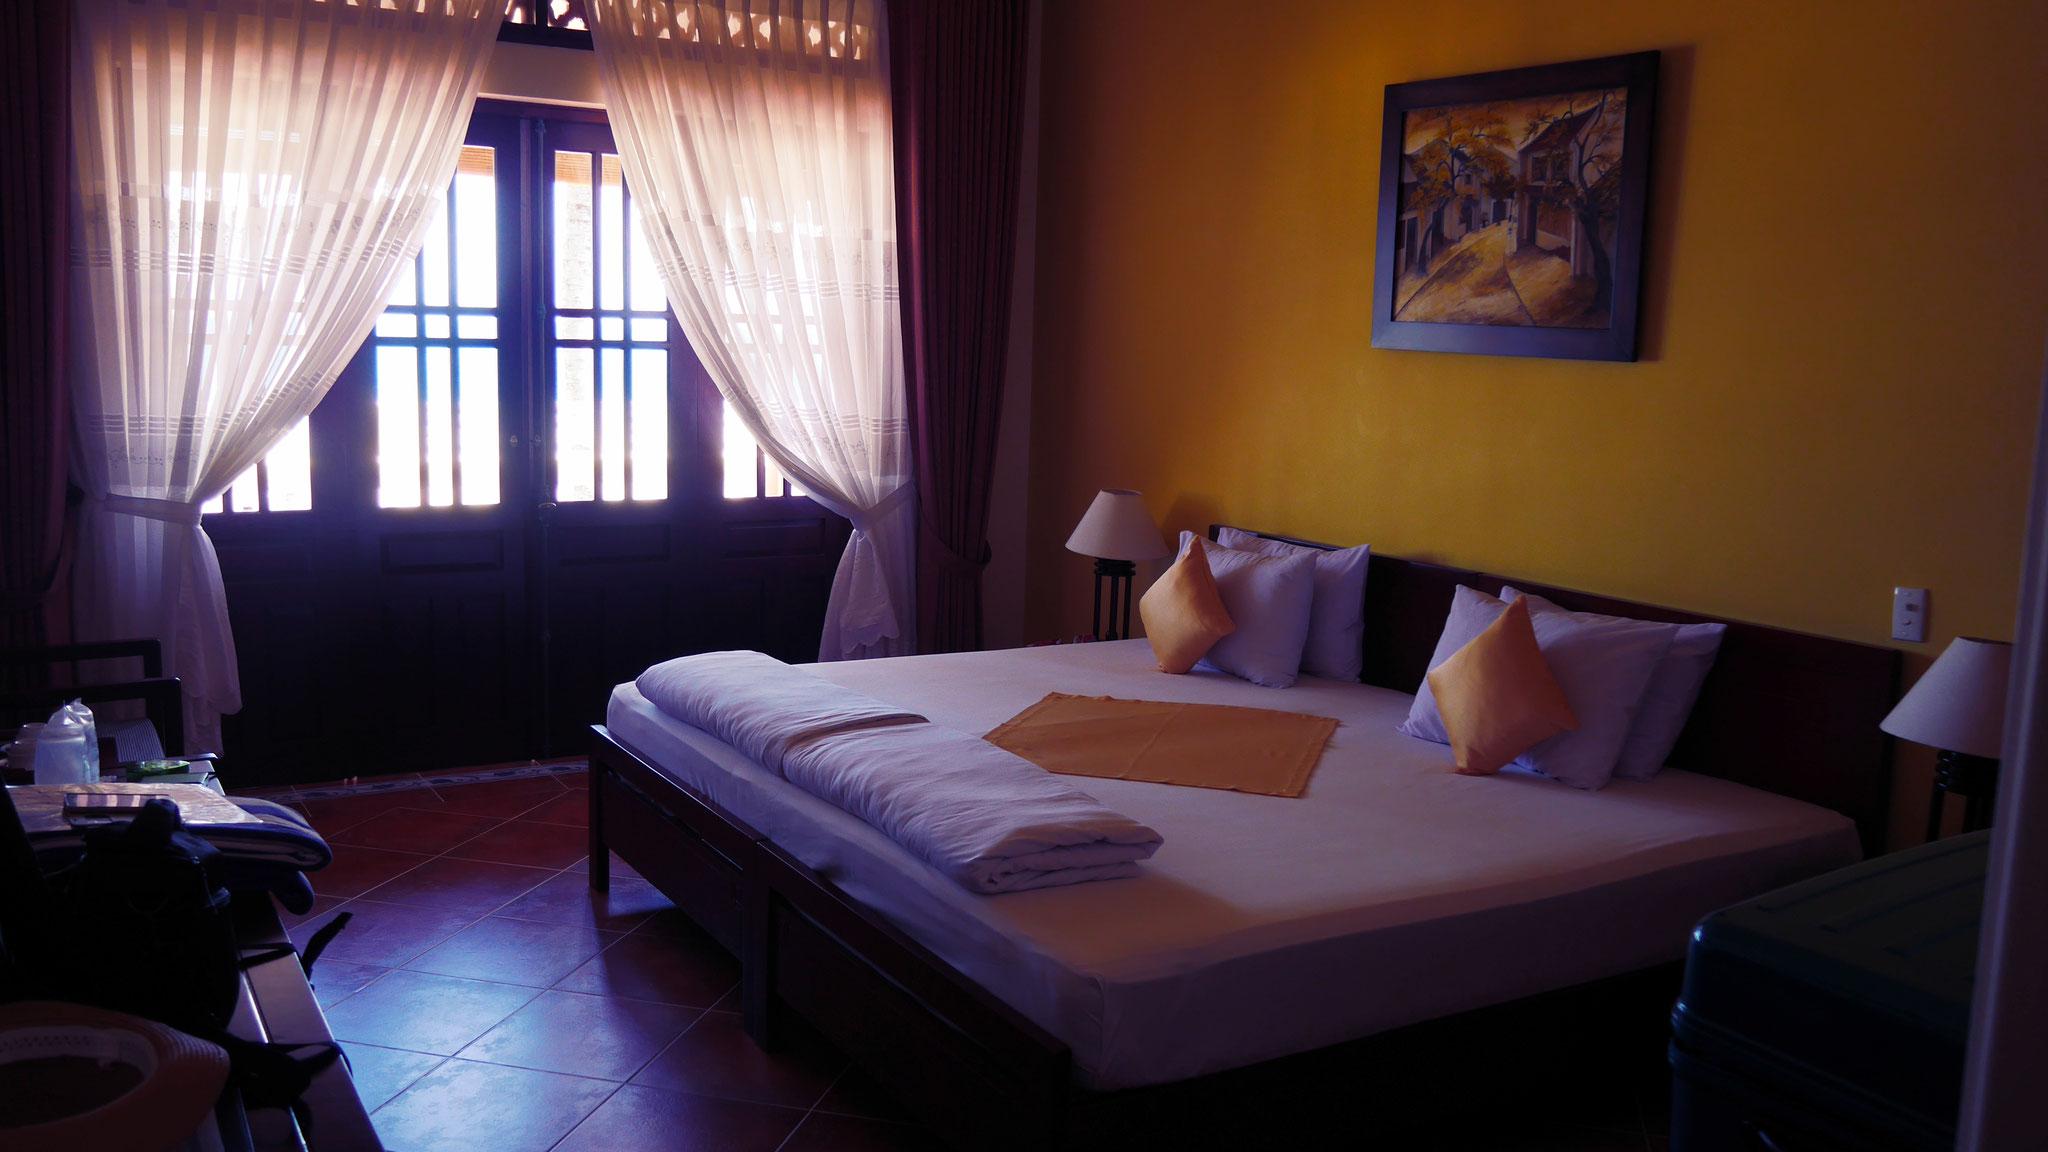 Phan tiet (Mui Ne) unser Hotel Amaryllis Resort & Spa